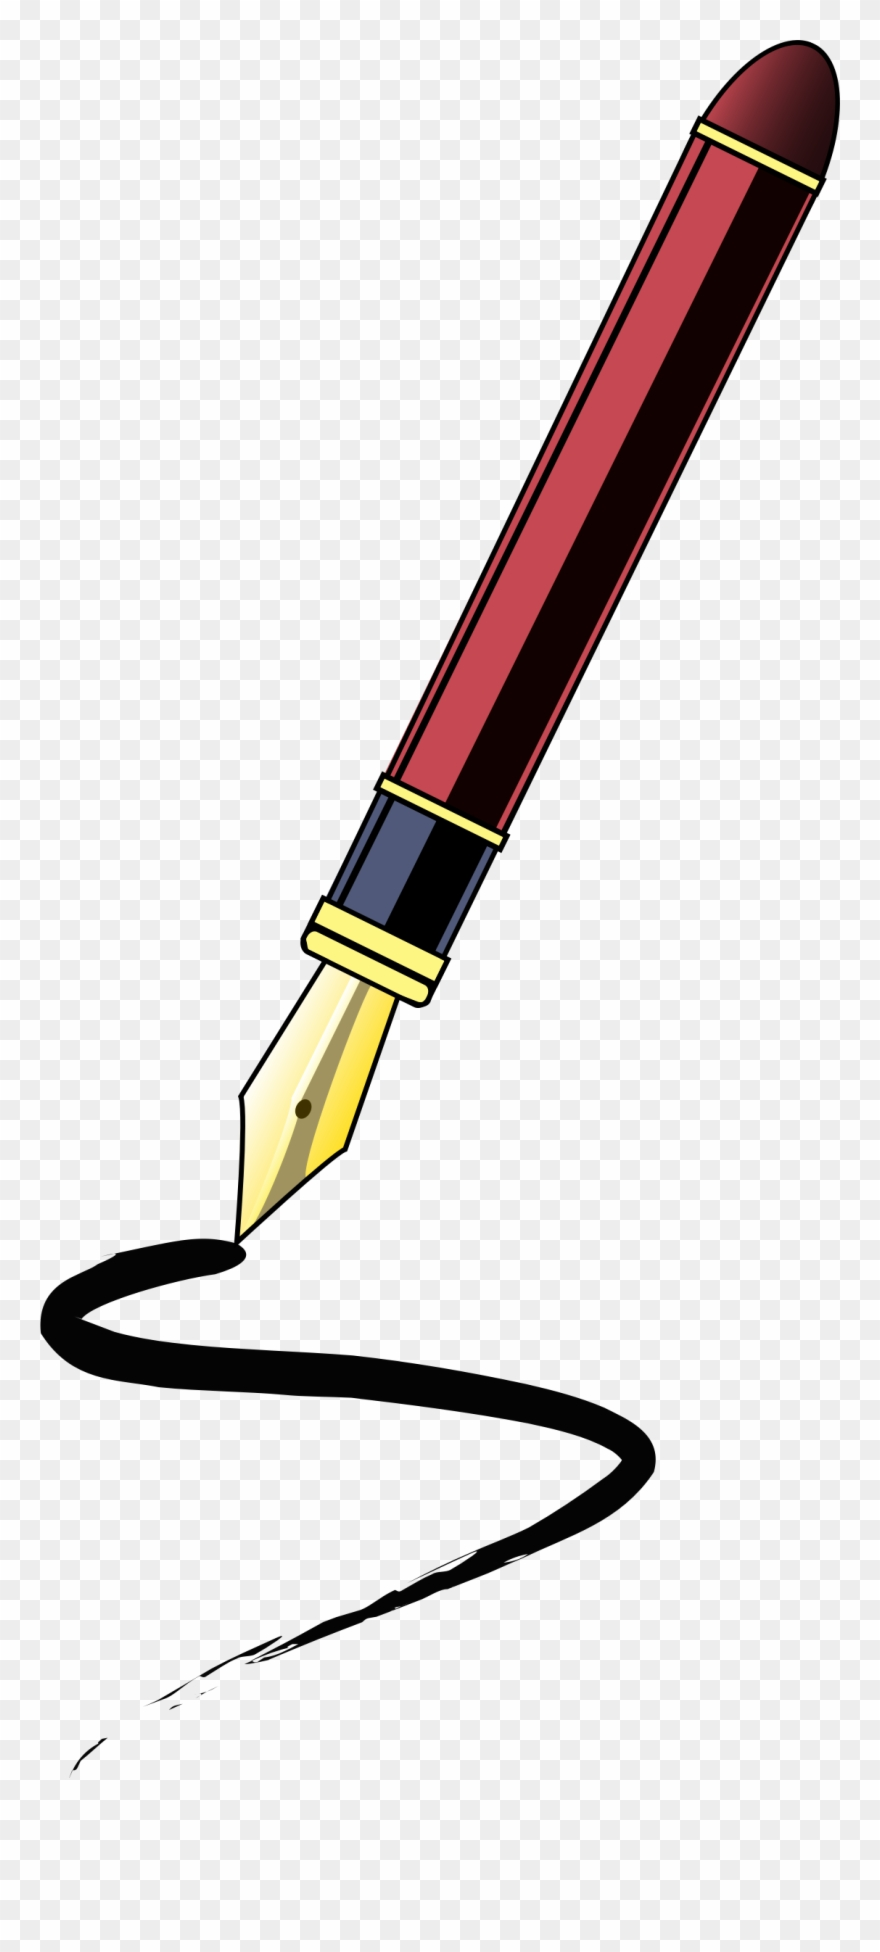 Pen clipart image graphic free stock Pen Clipart Journalist - Pen Clip Art - Png Download ... graphic free stock